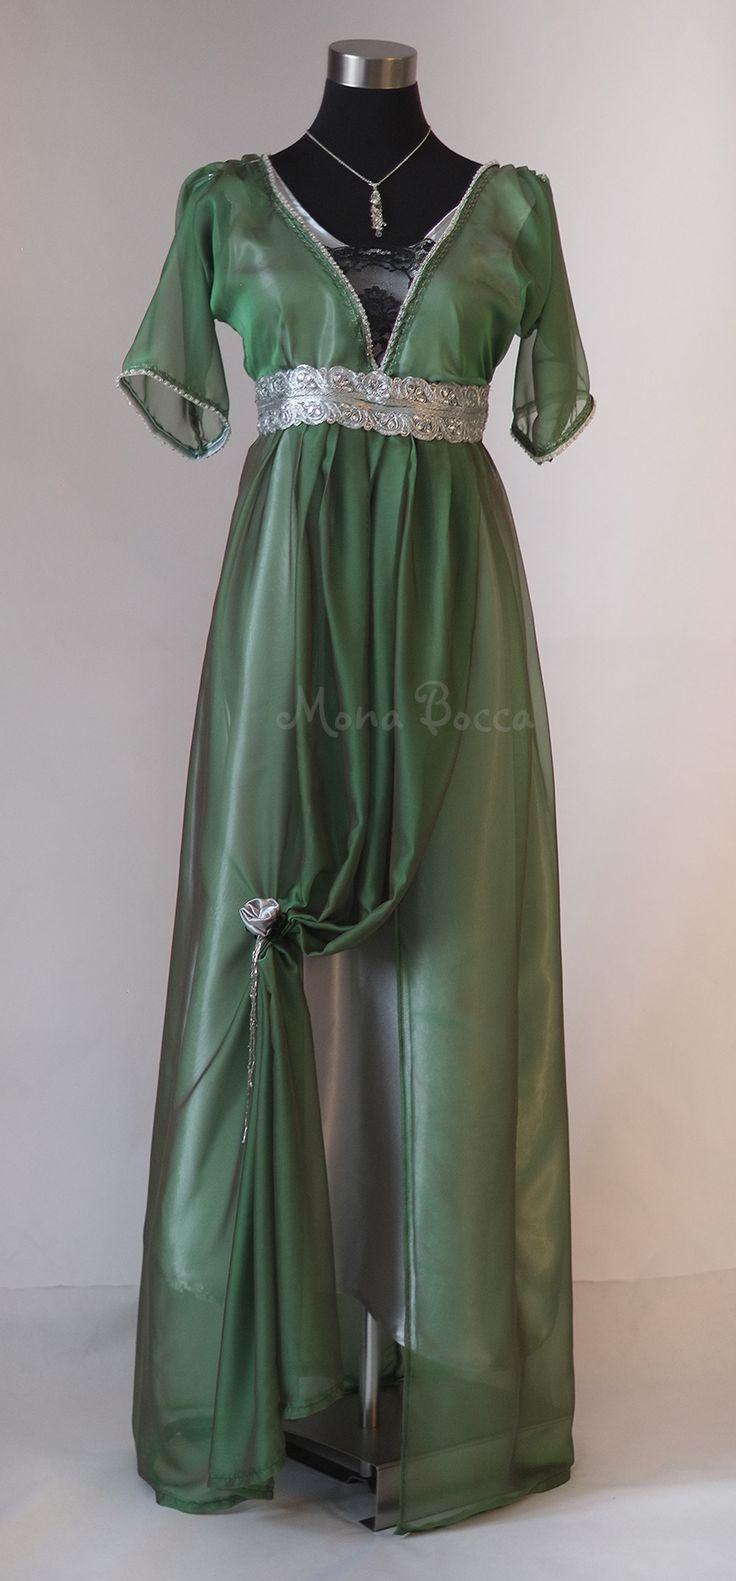 7 best Edwardian dresses by Mona bocca images on Pinterest ...